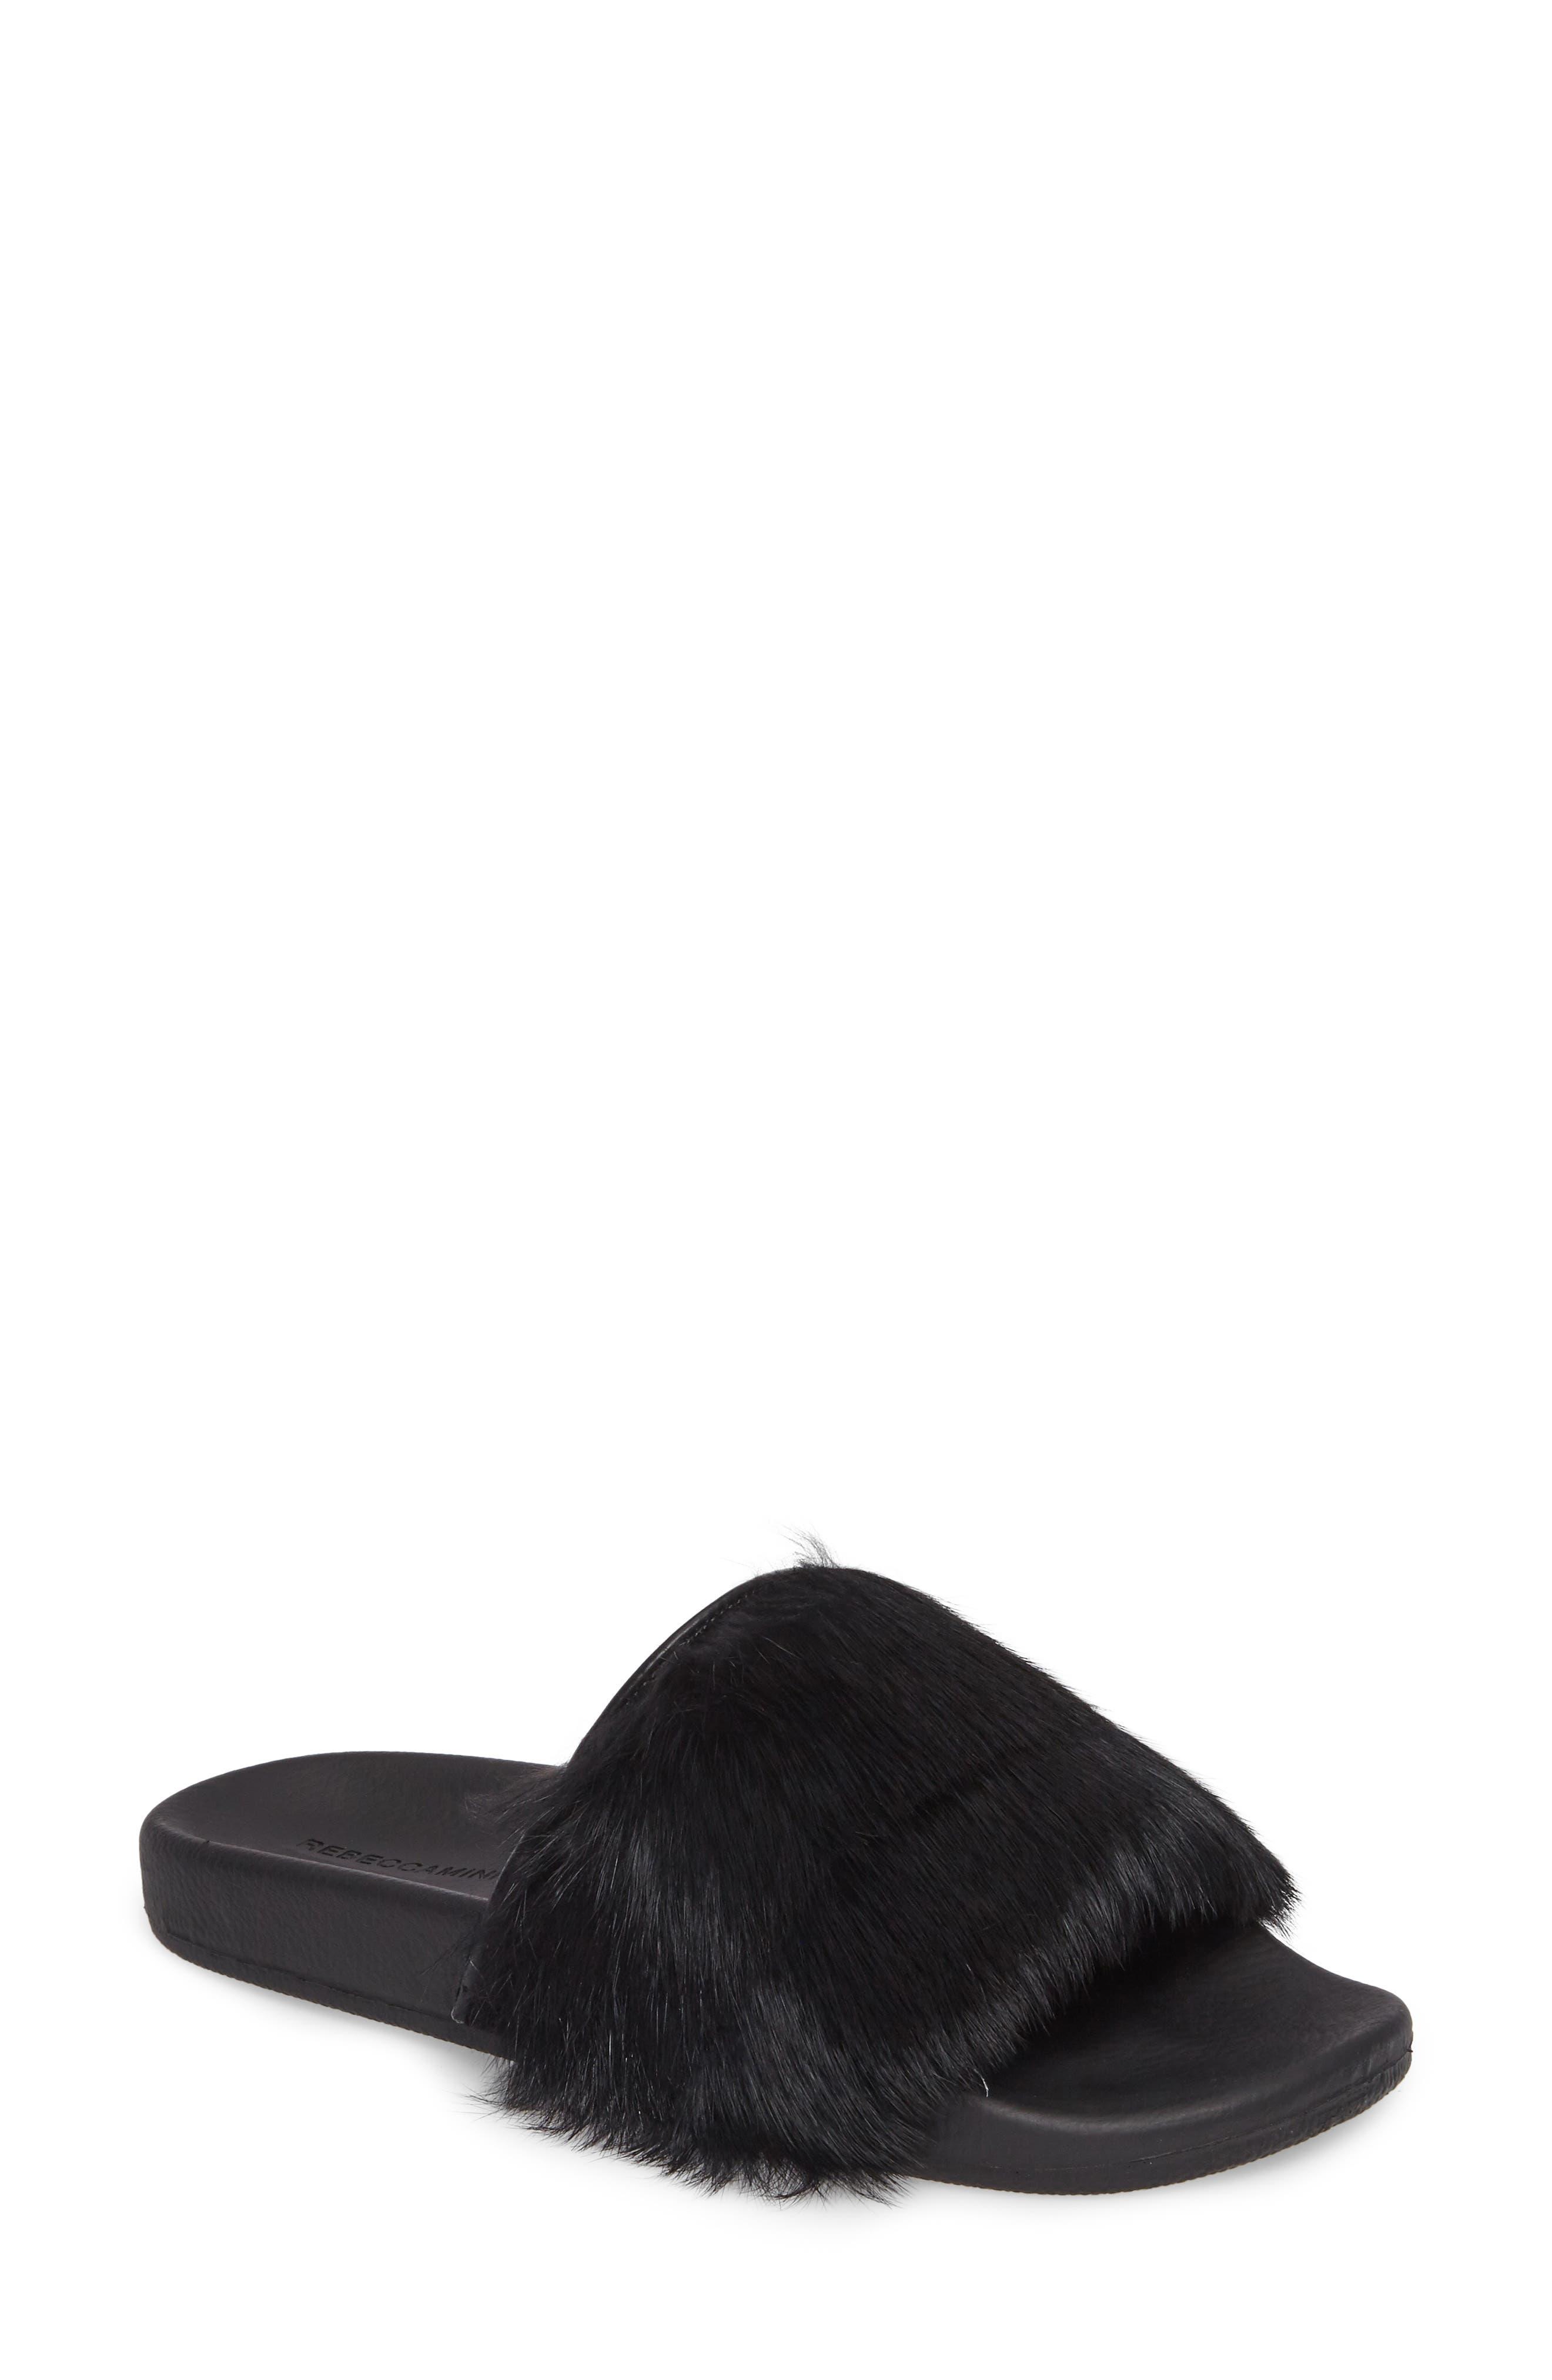 Sammi Genuine Fur Slide Sandal,                             Main thumbnail 1, color,                             001